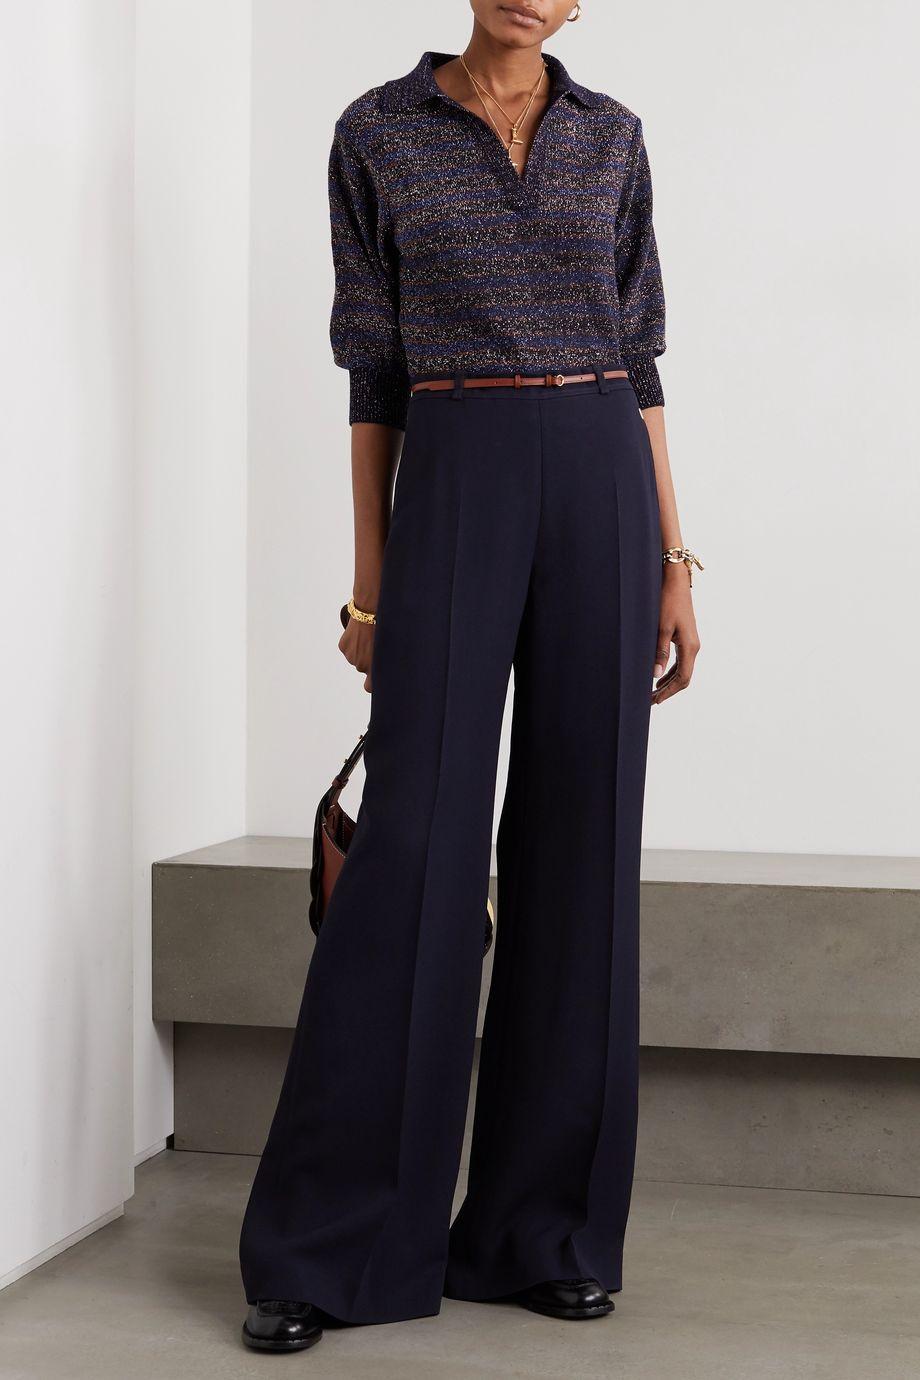 Chloé Wool-blend Lurex polo shirt